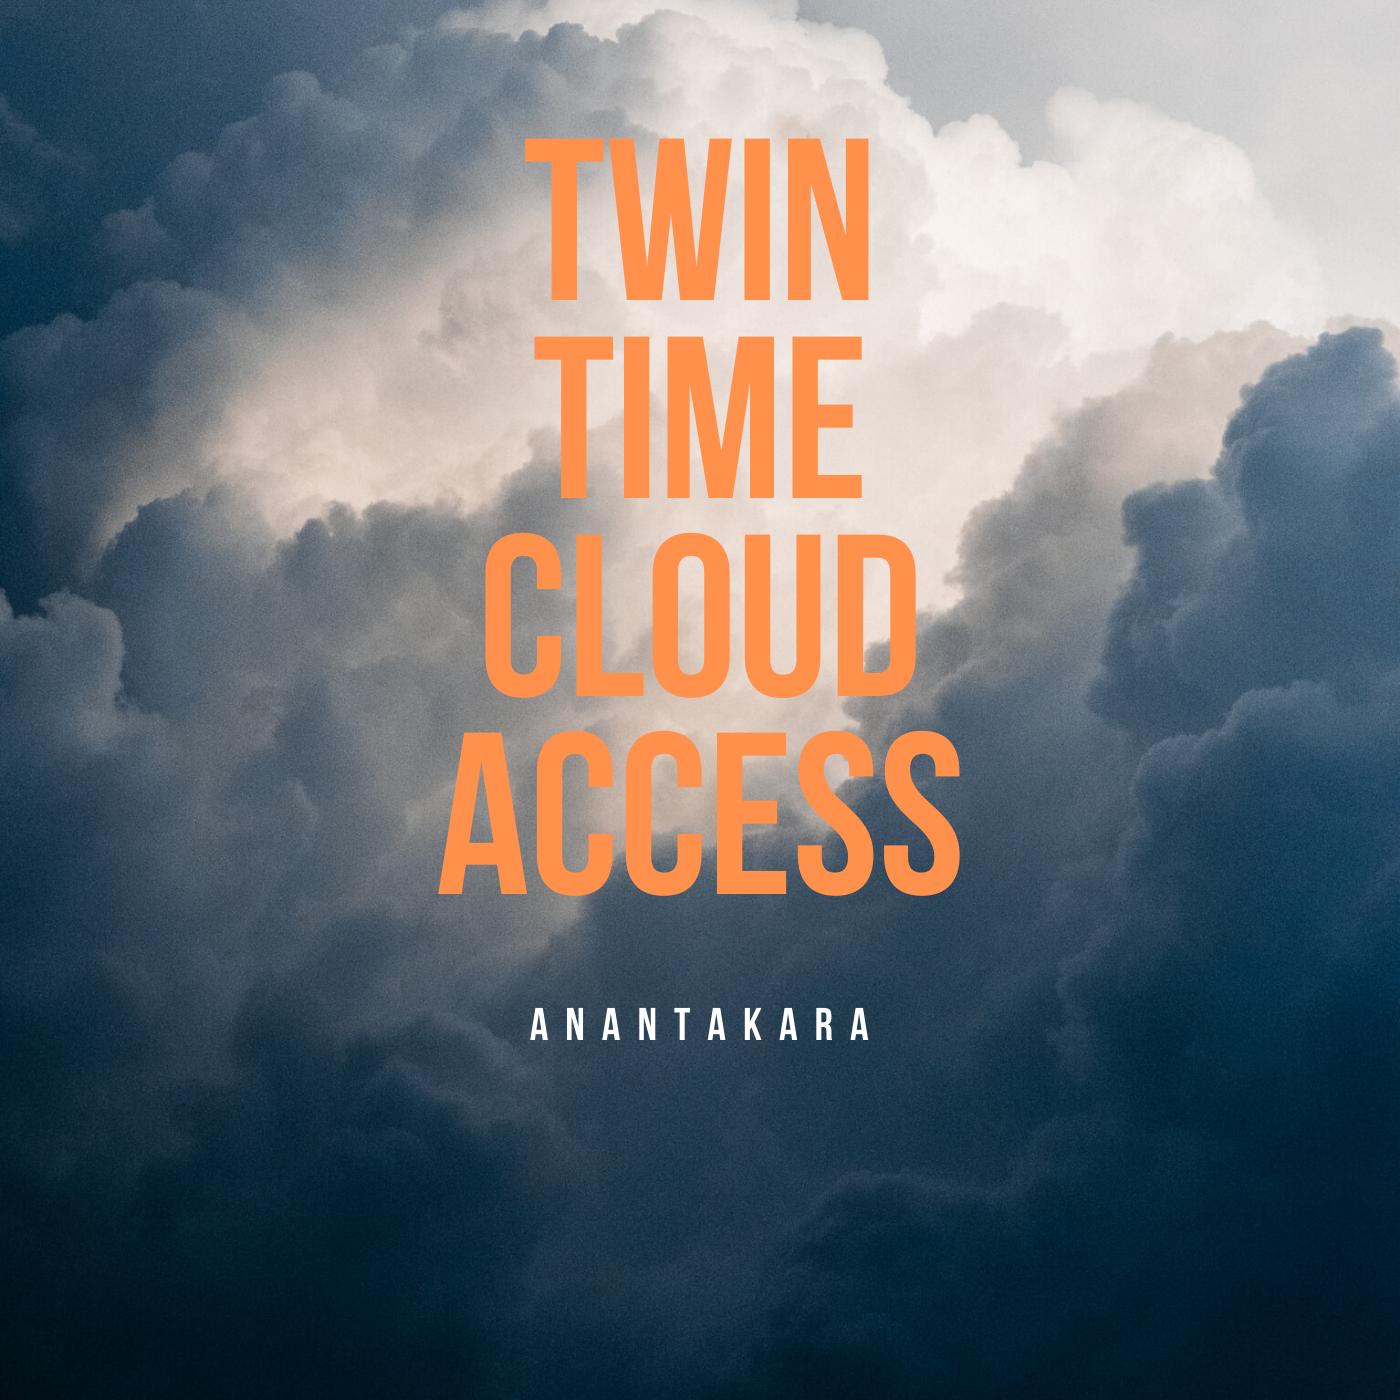 twin time cloud access anantakara music album